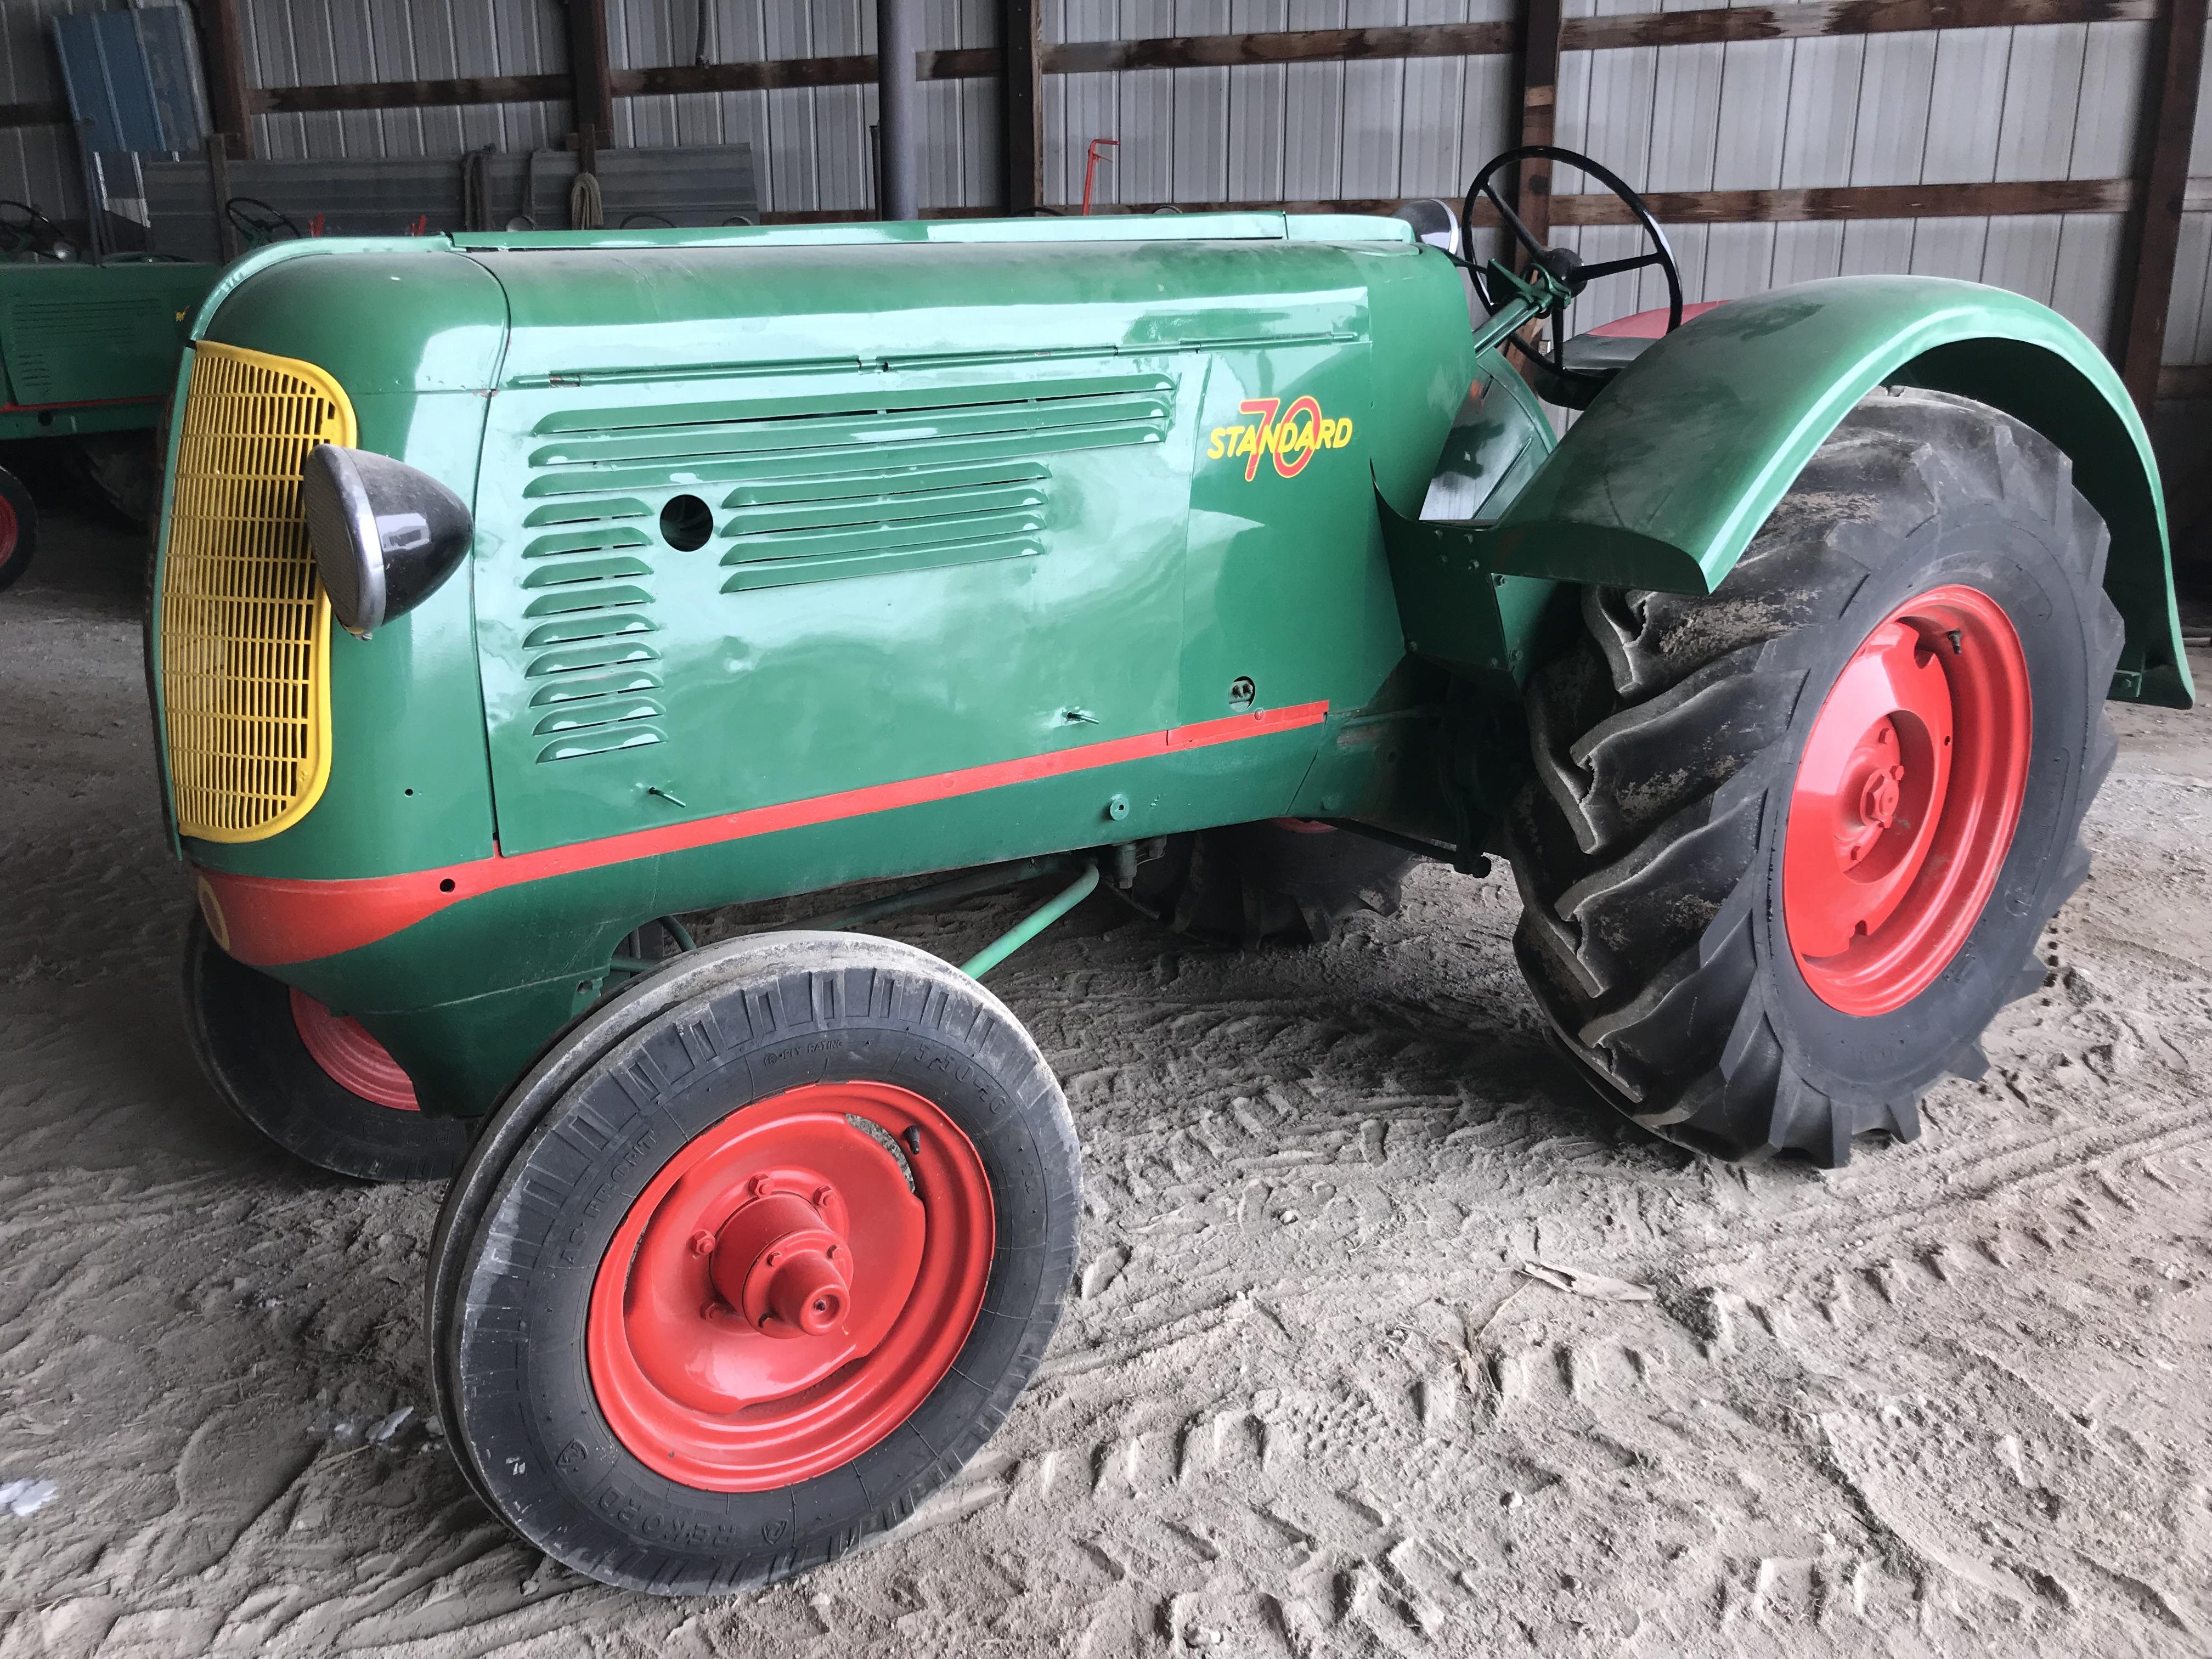 Lot 6 - Mdl.70 Standard, New Rubber (restored)